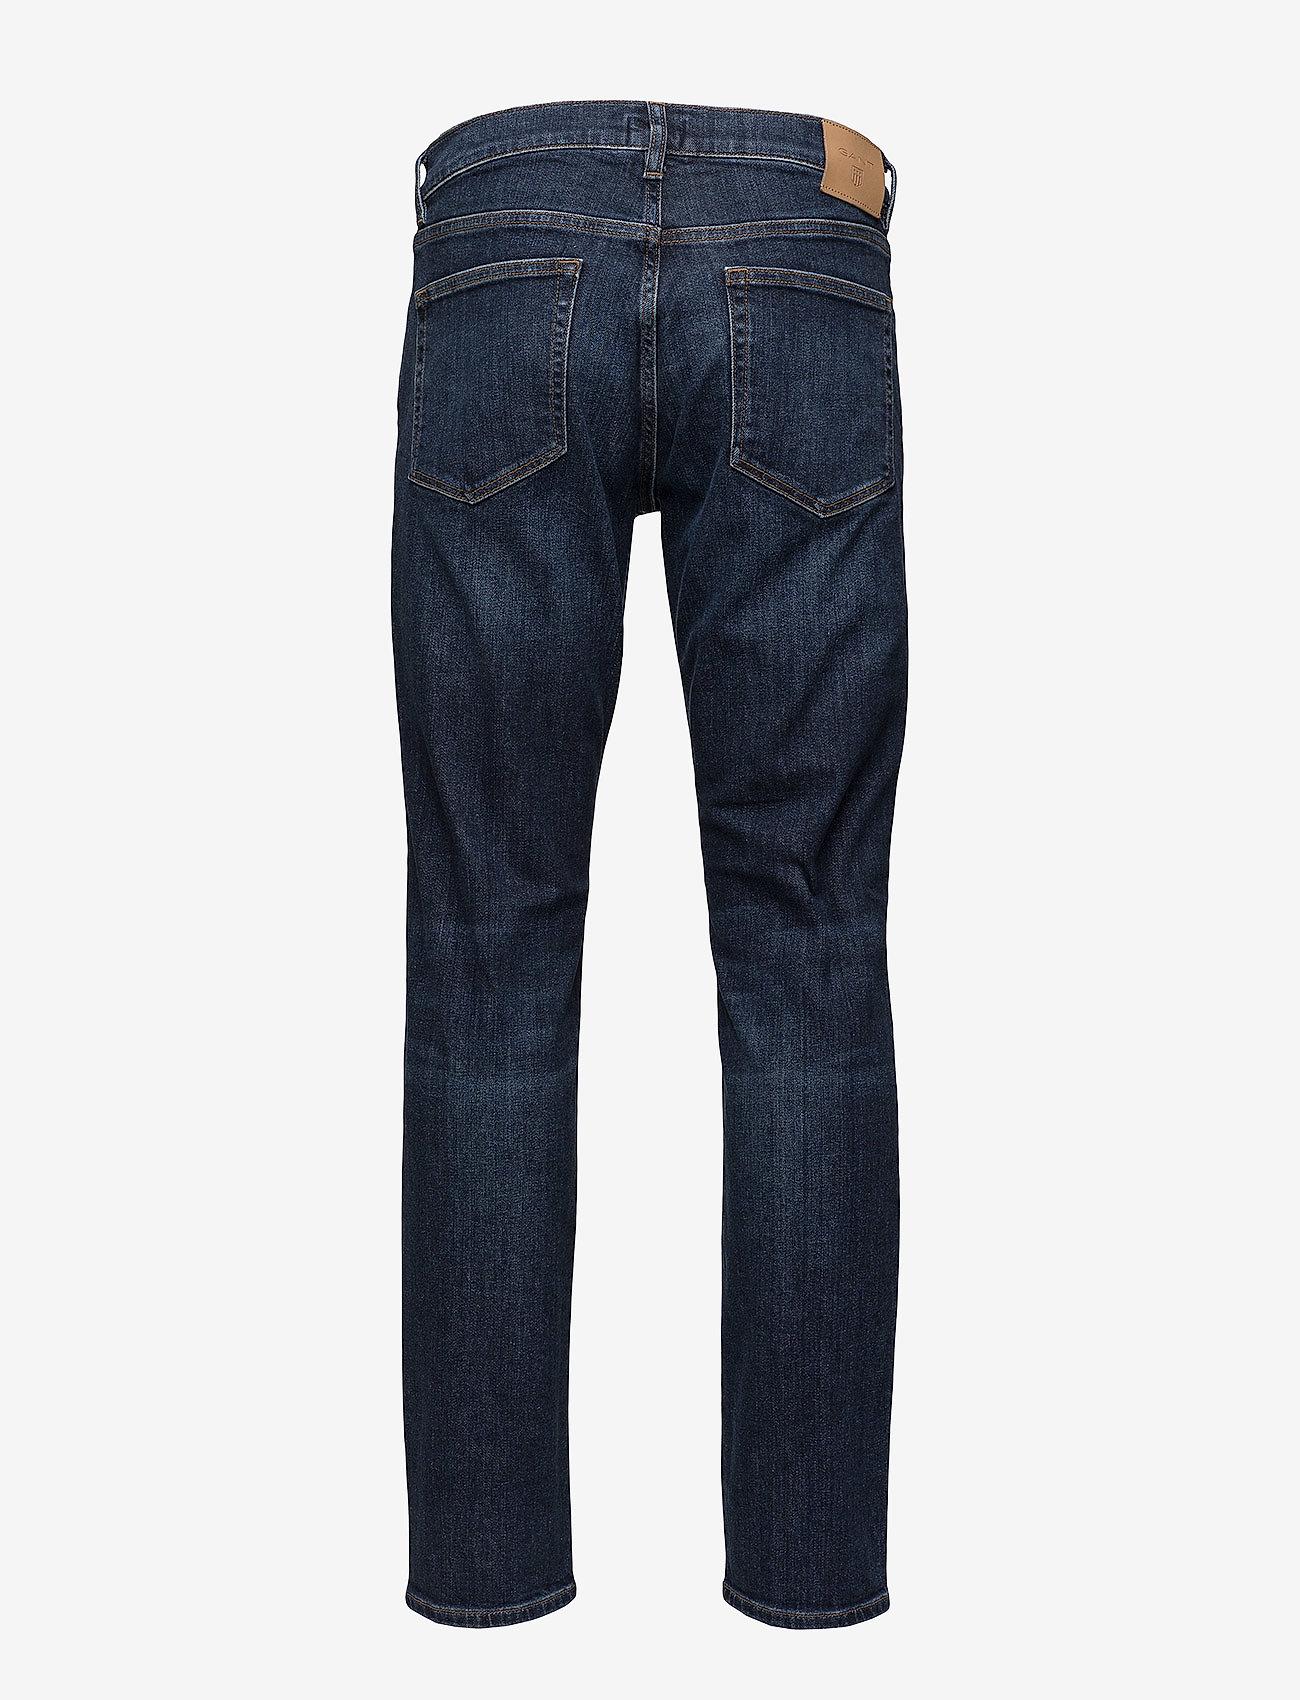 GANT - SLIM GANT JEANS - slim jeans - dark blue worn in - 1